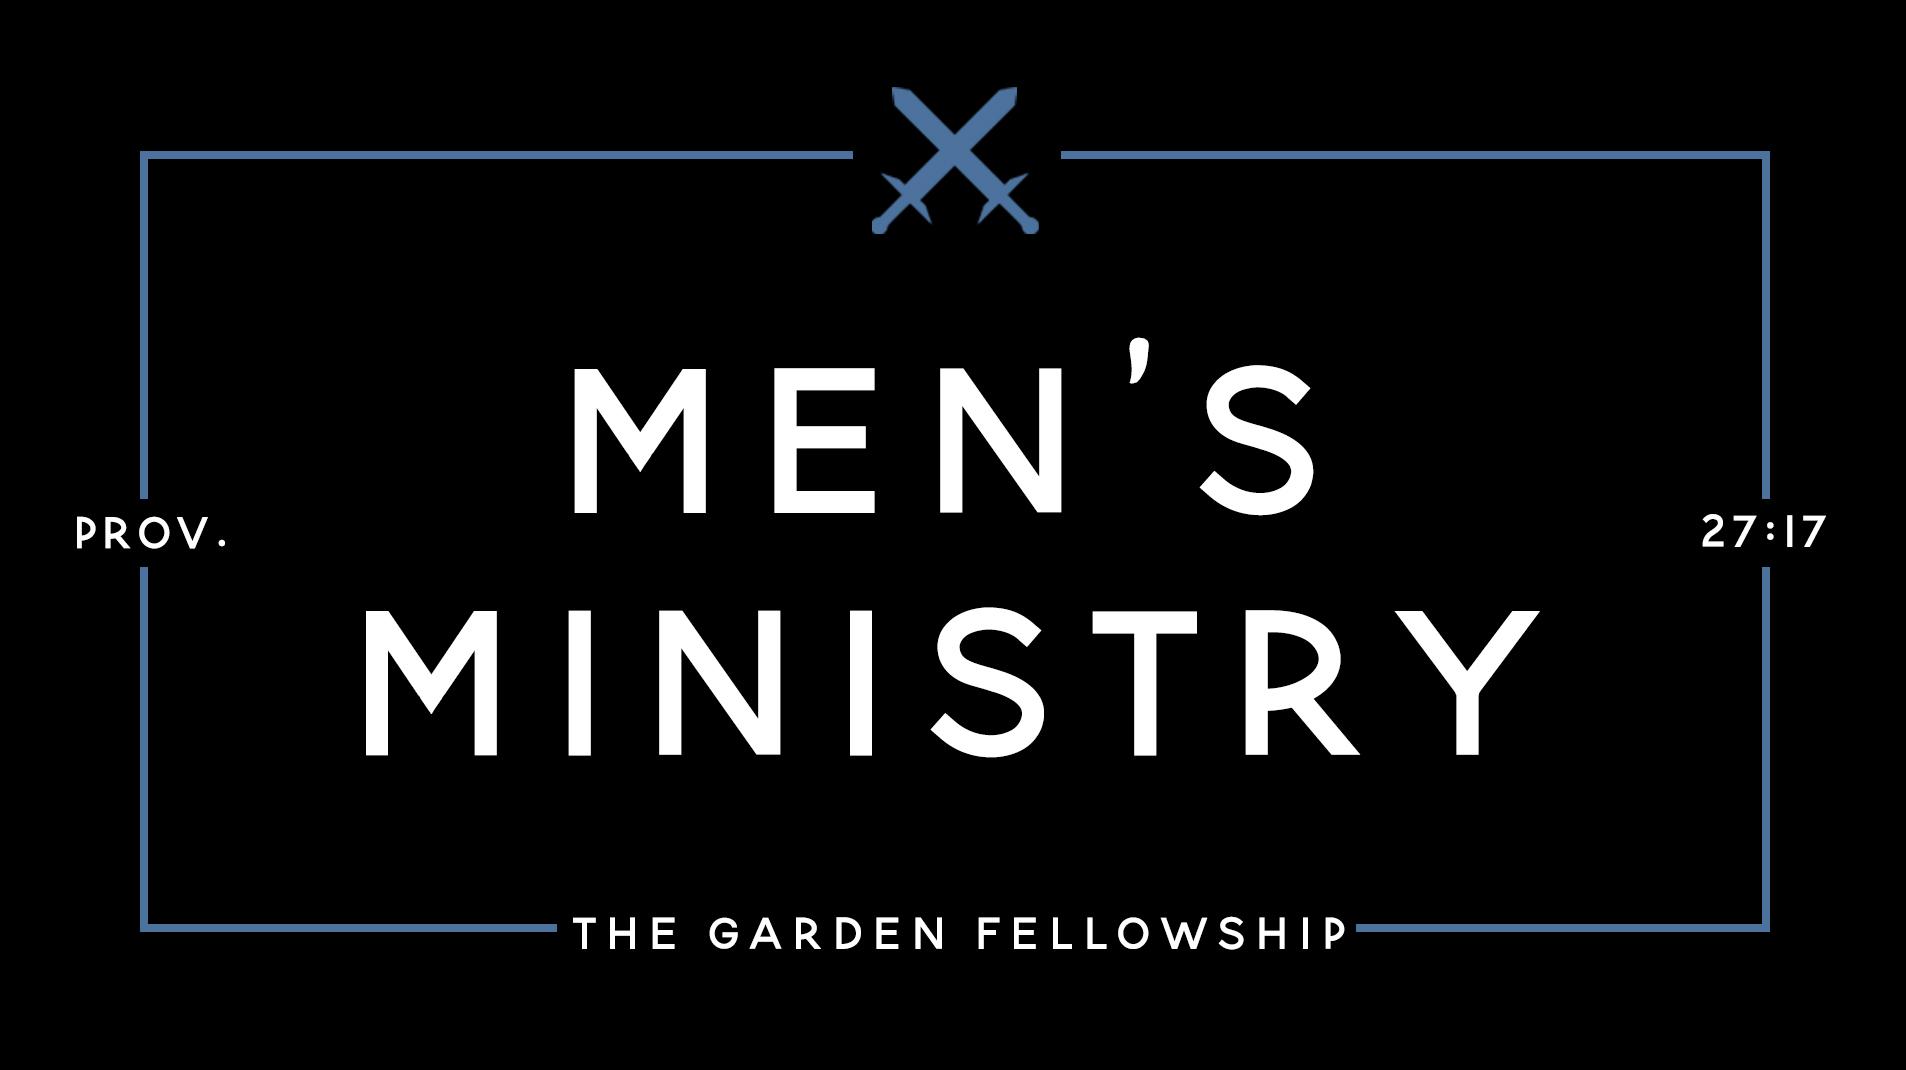 mens monthly fellowship on livestream - The Garden Fellowship